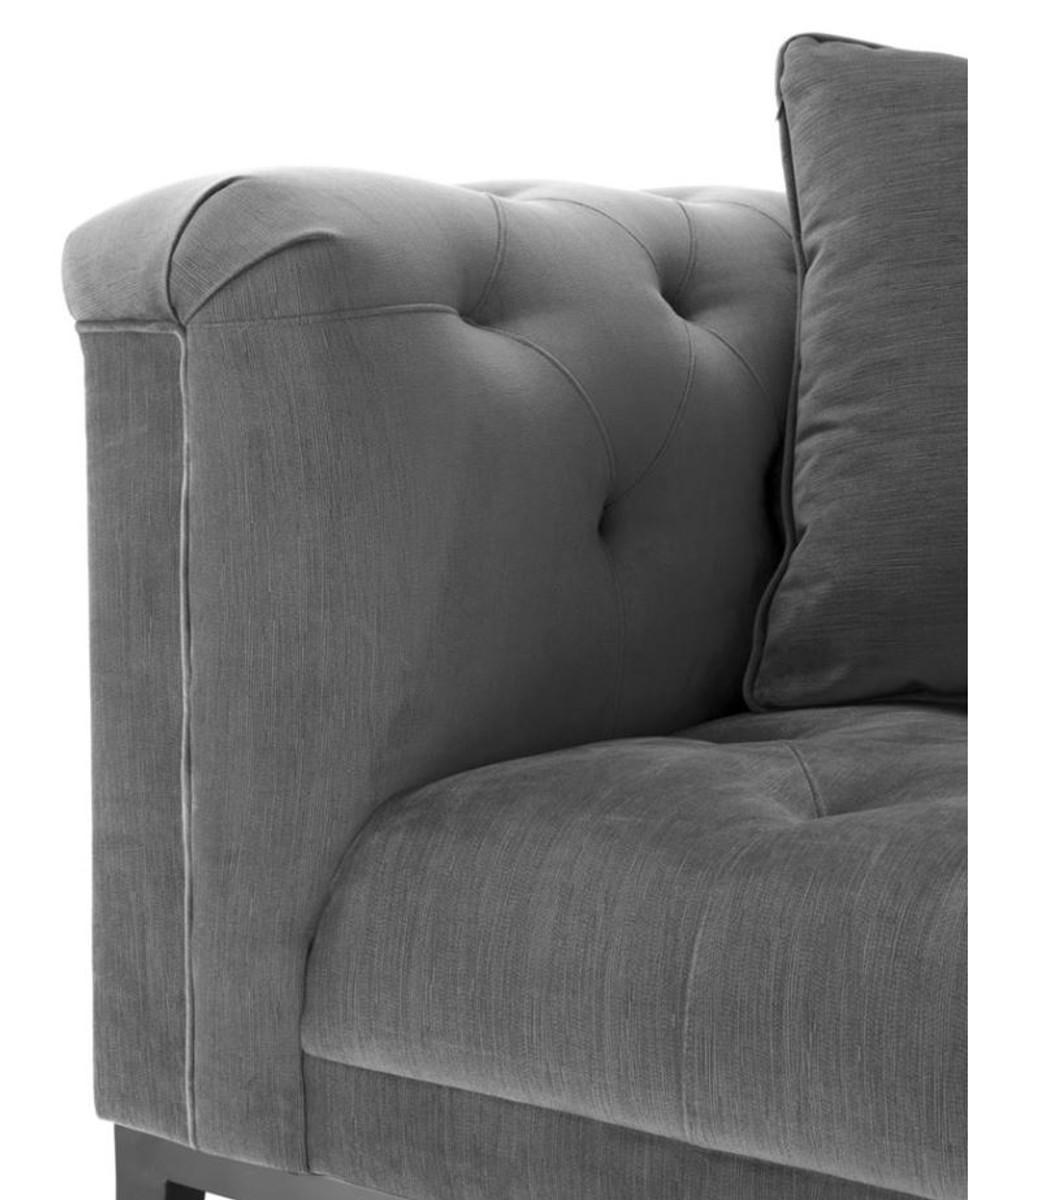 casa padrino luxus sessel grau wohnzimmer m bel sessel. Black Bedroom Furniture Sets. Home Design Ideas